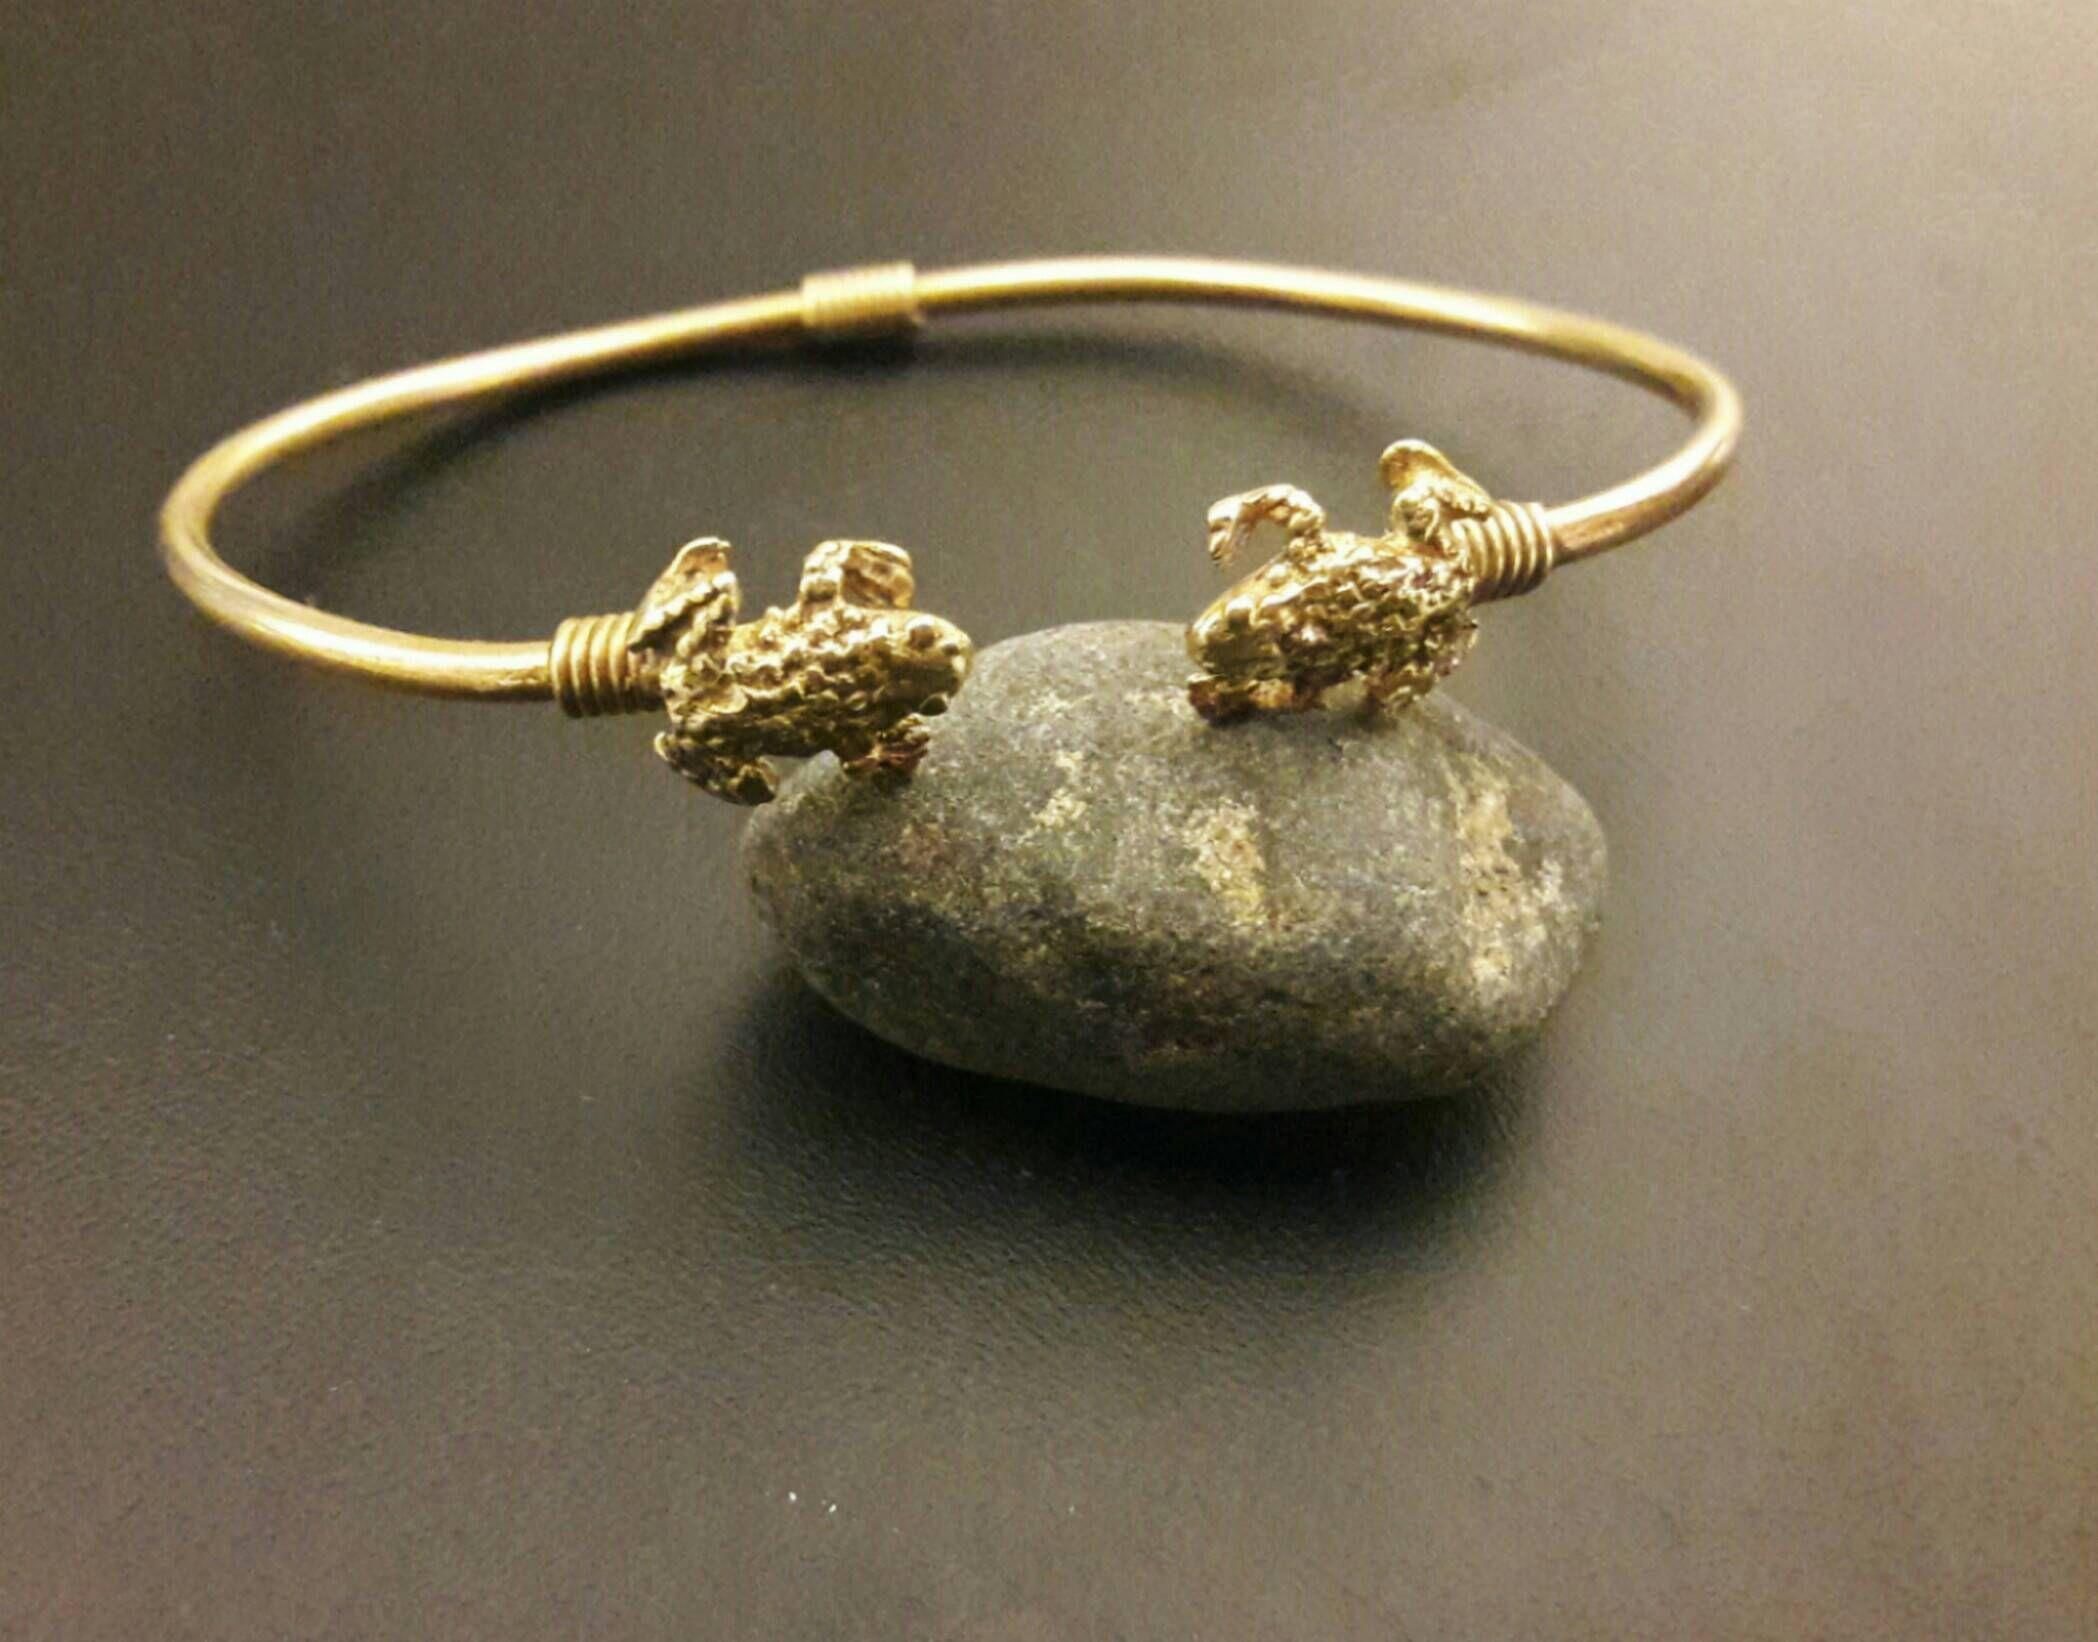 Mans bangle cuff braceletgolden banglebrass cuff braceleteligat